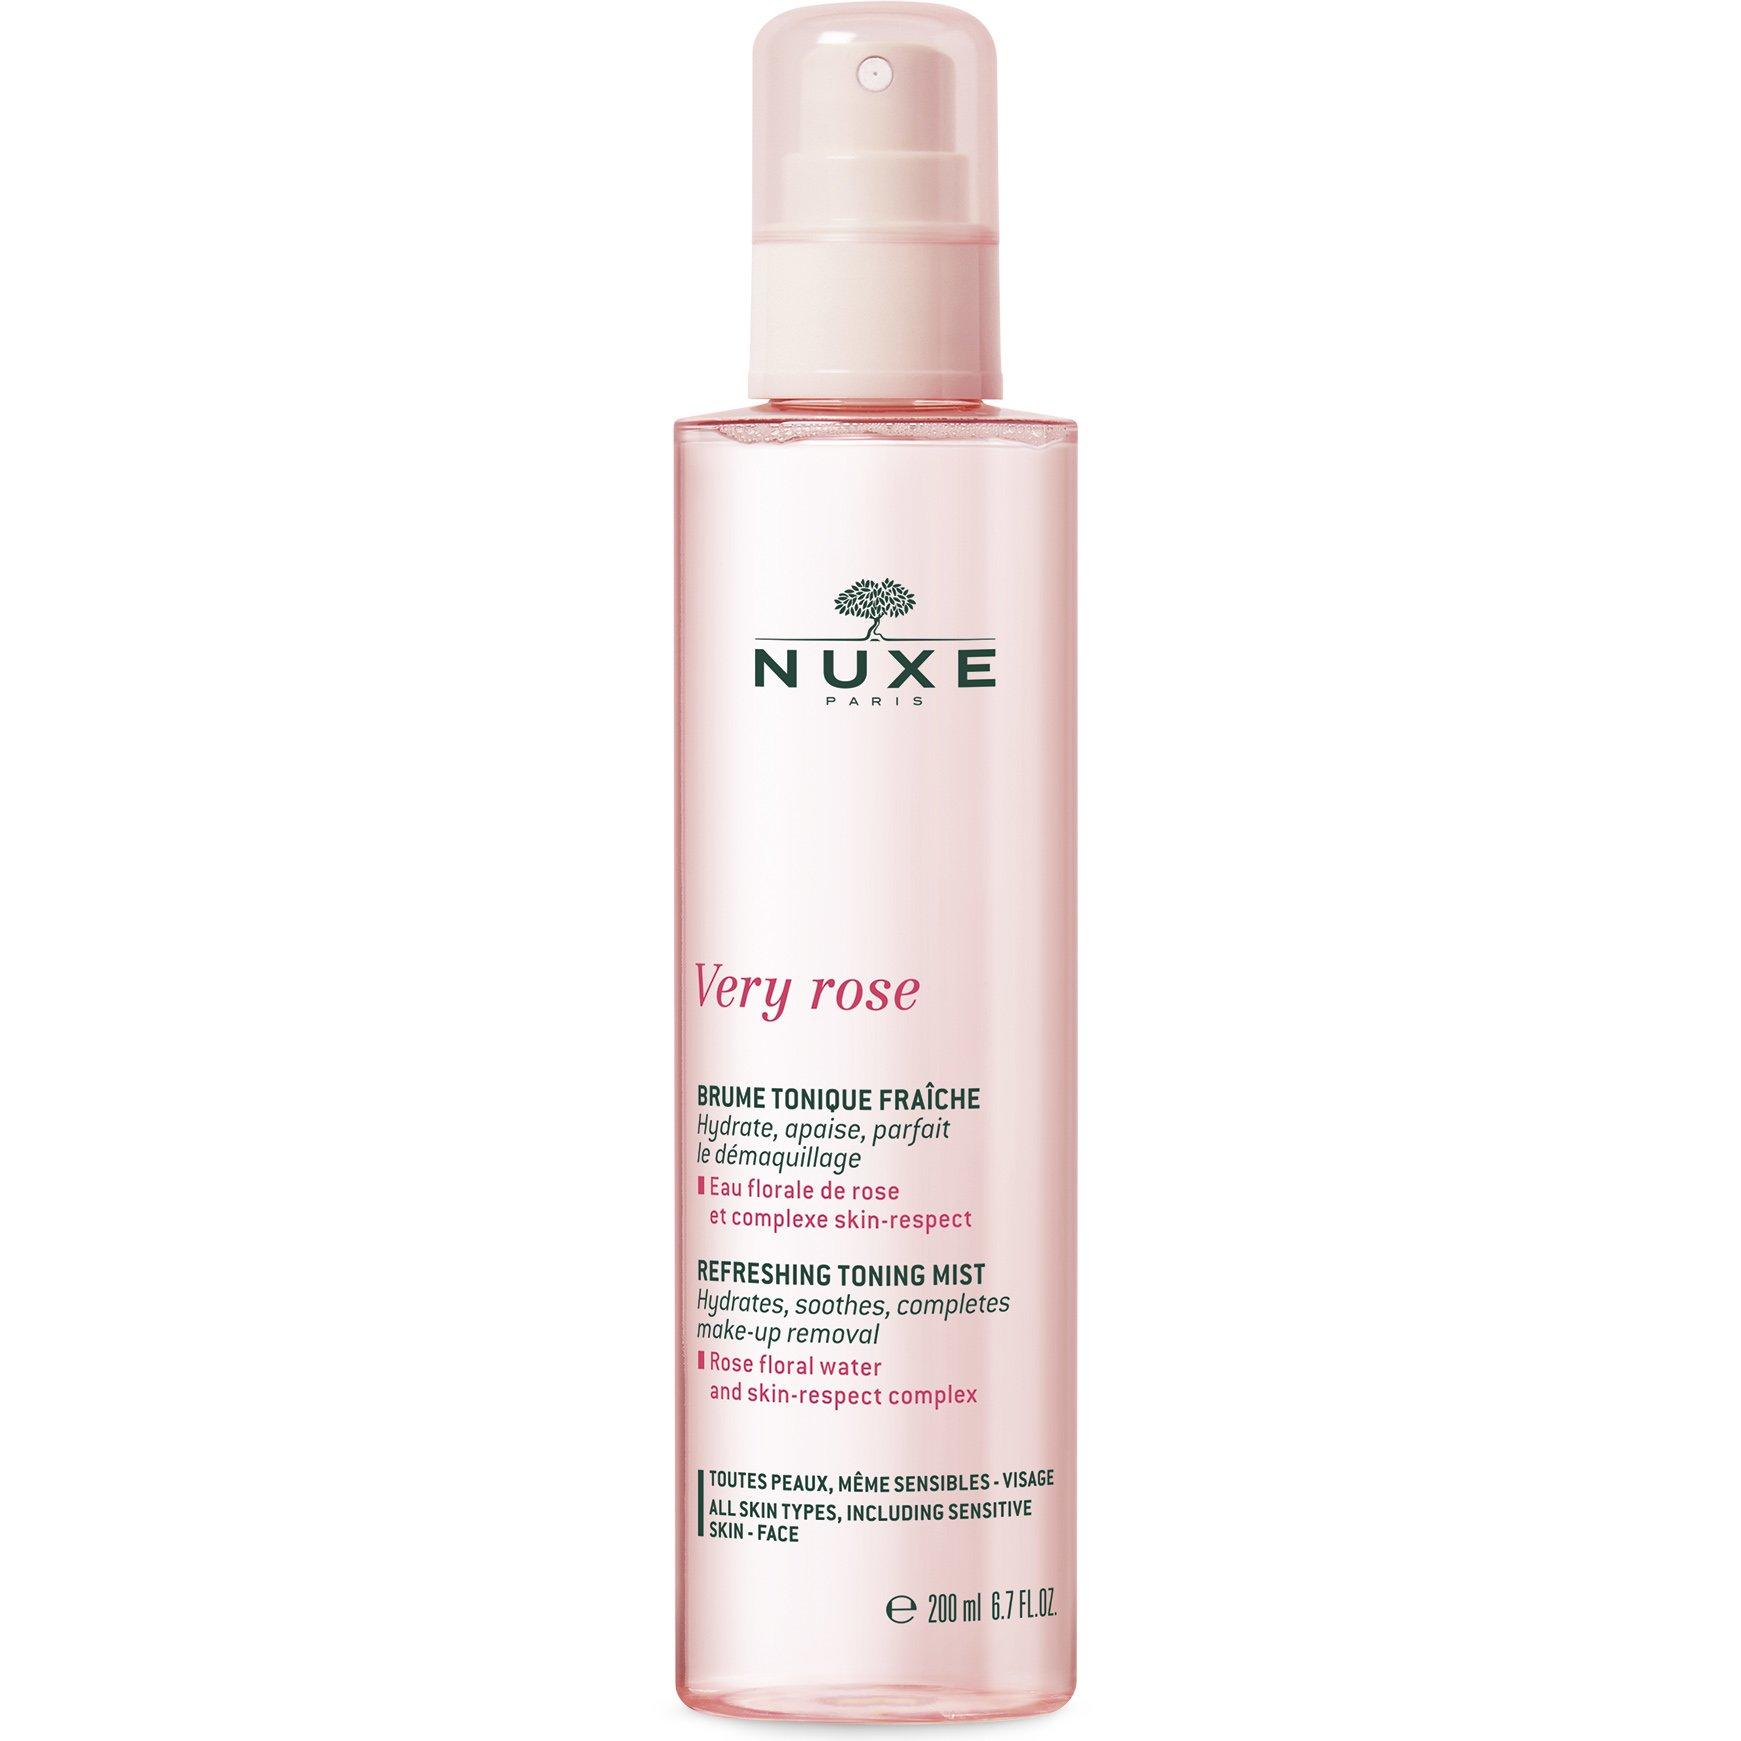 Nuxe Very Rose Refreshing Toning Mist Δροσιστική Τονωτική & Ενυδατική Λοσιόν σε Spray για το Πρόσωπο με Ροδόνερο 200ml